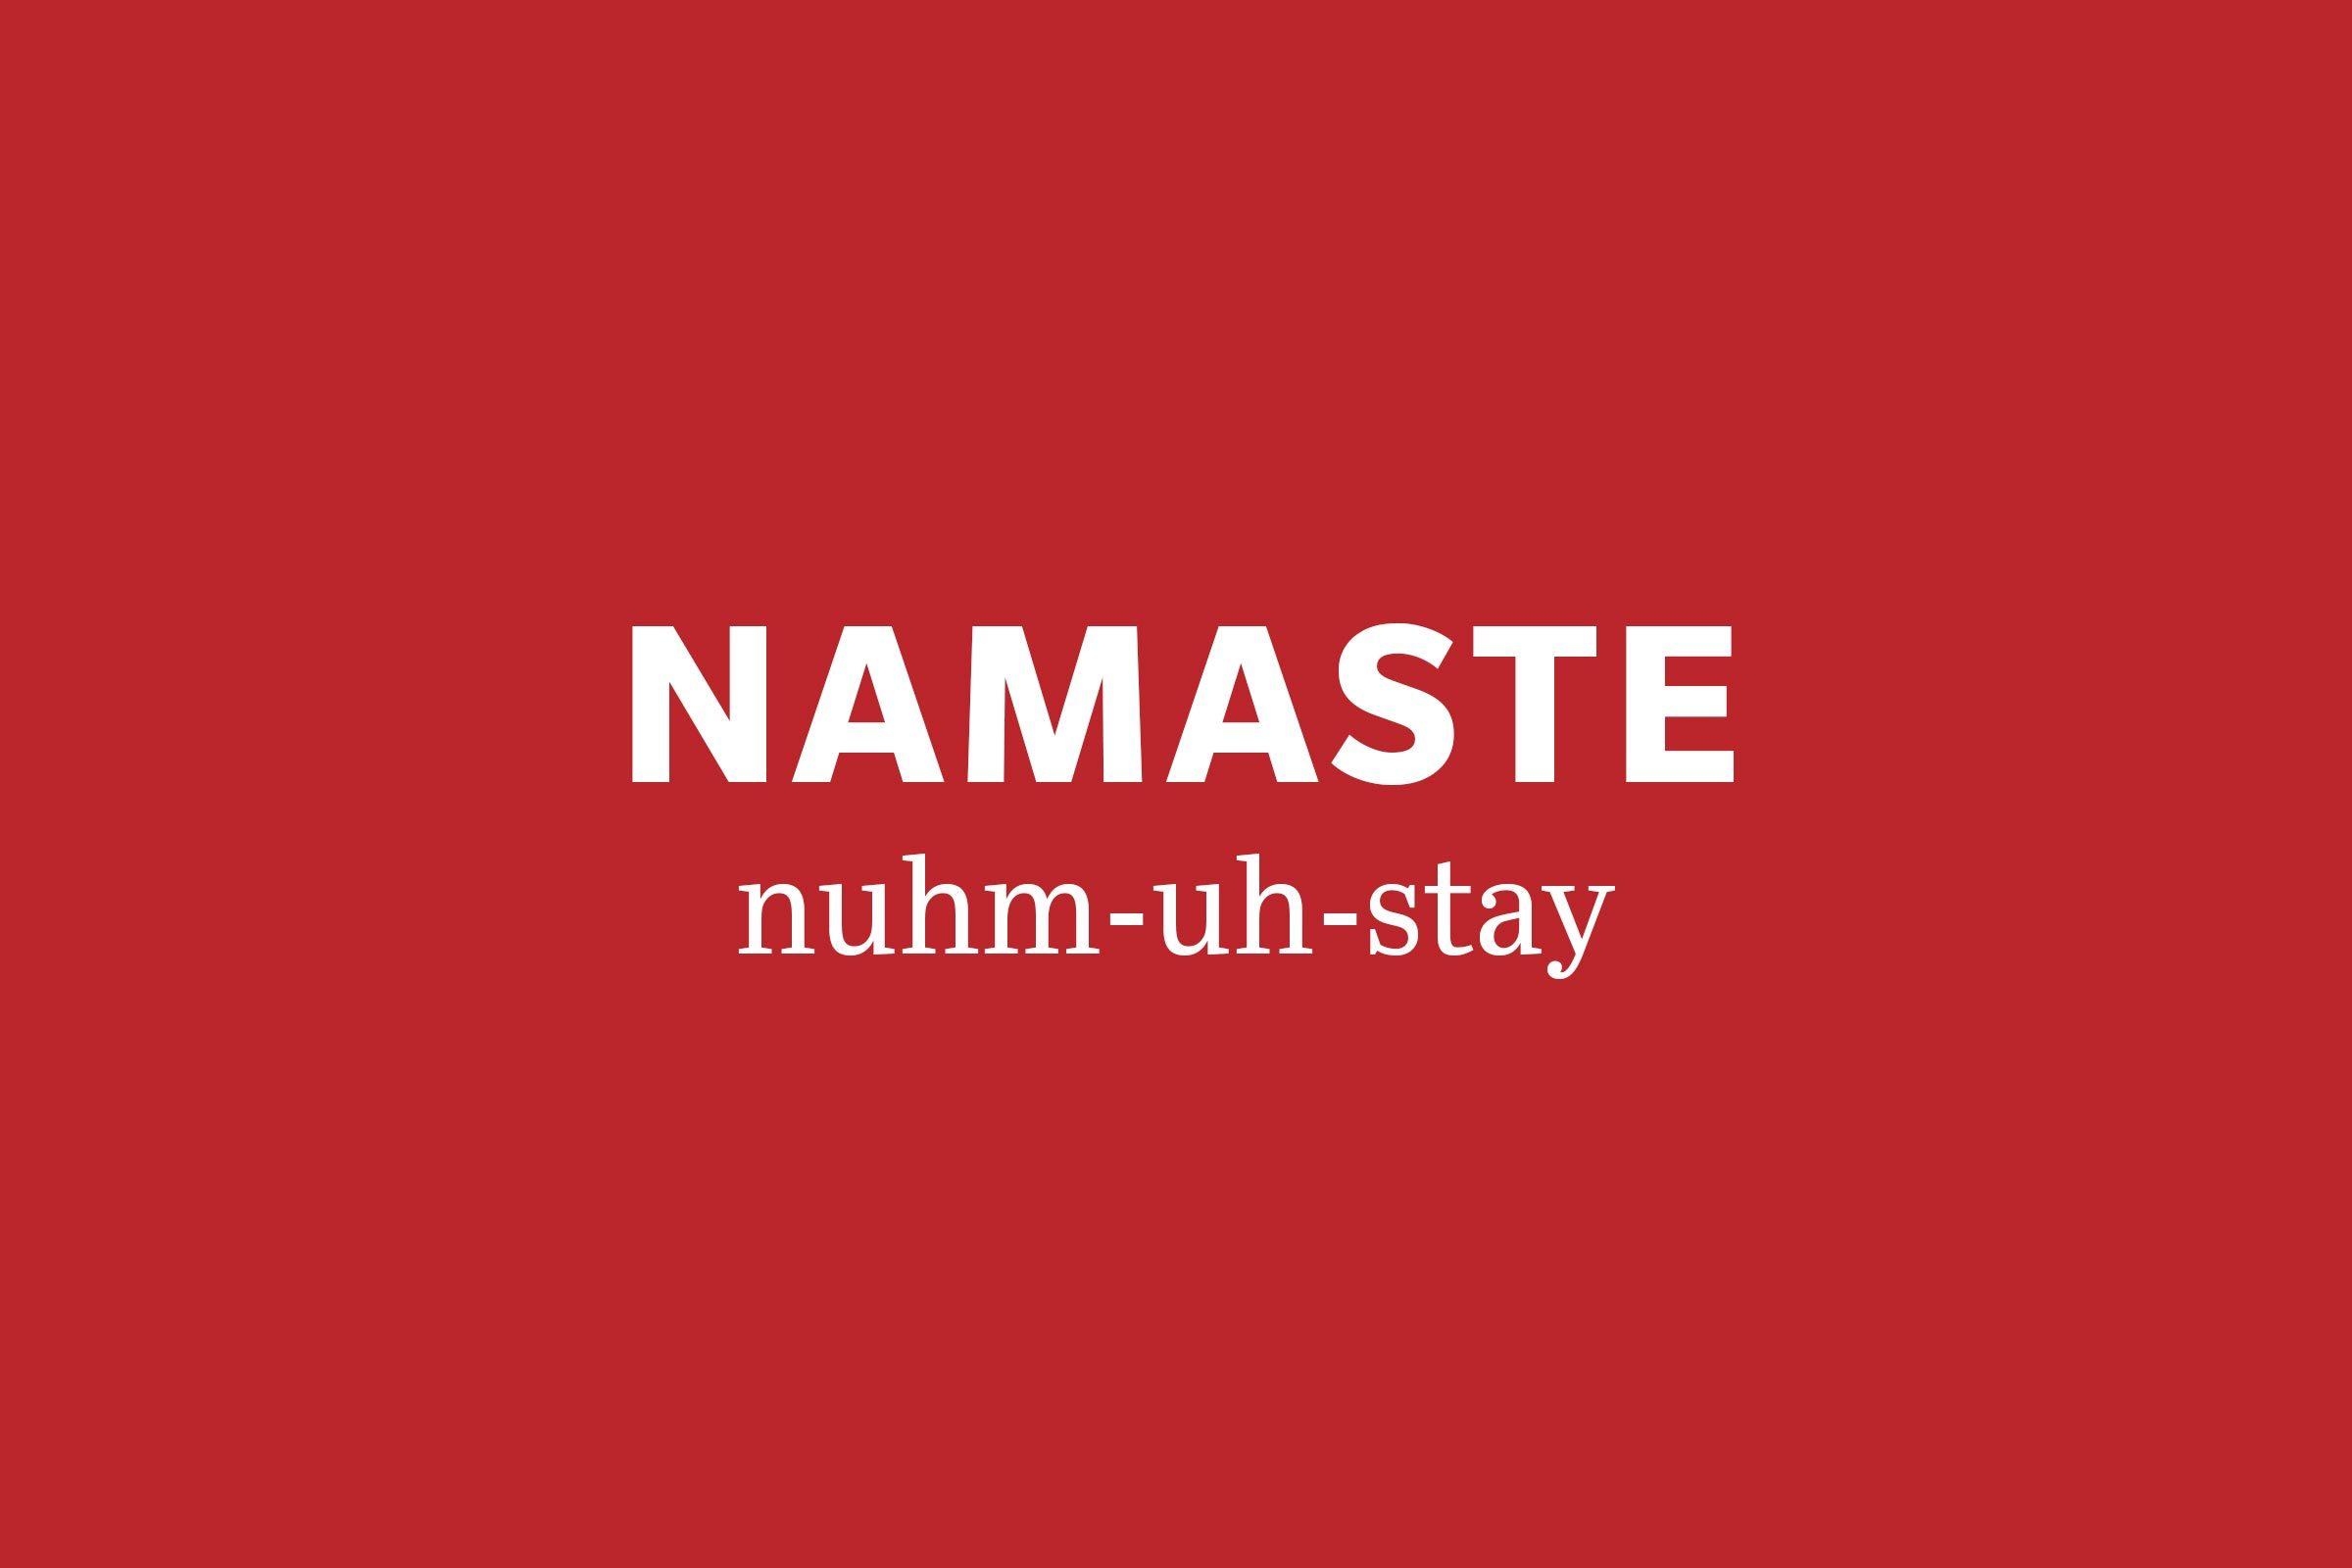 namaste pronunciation